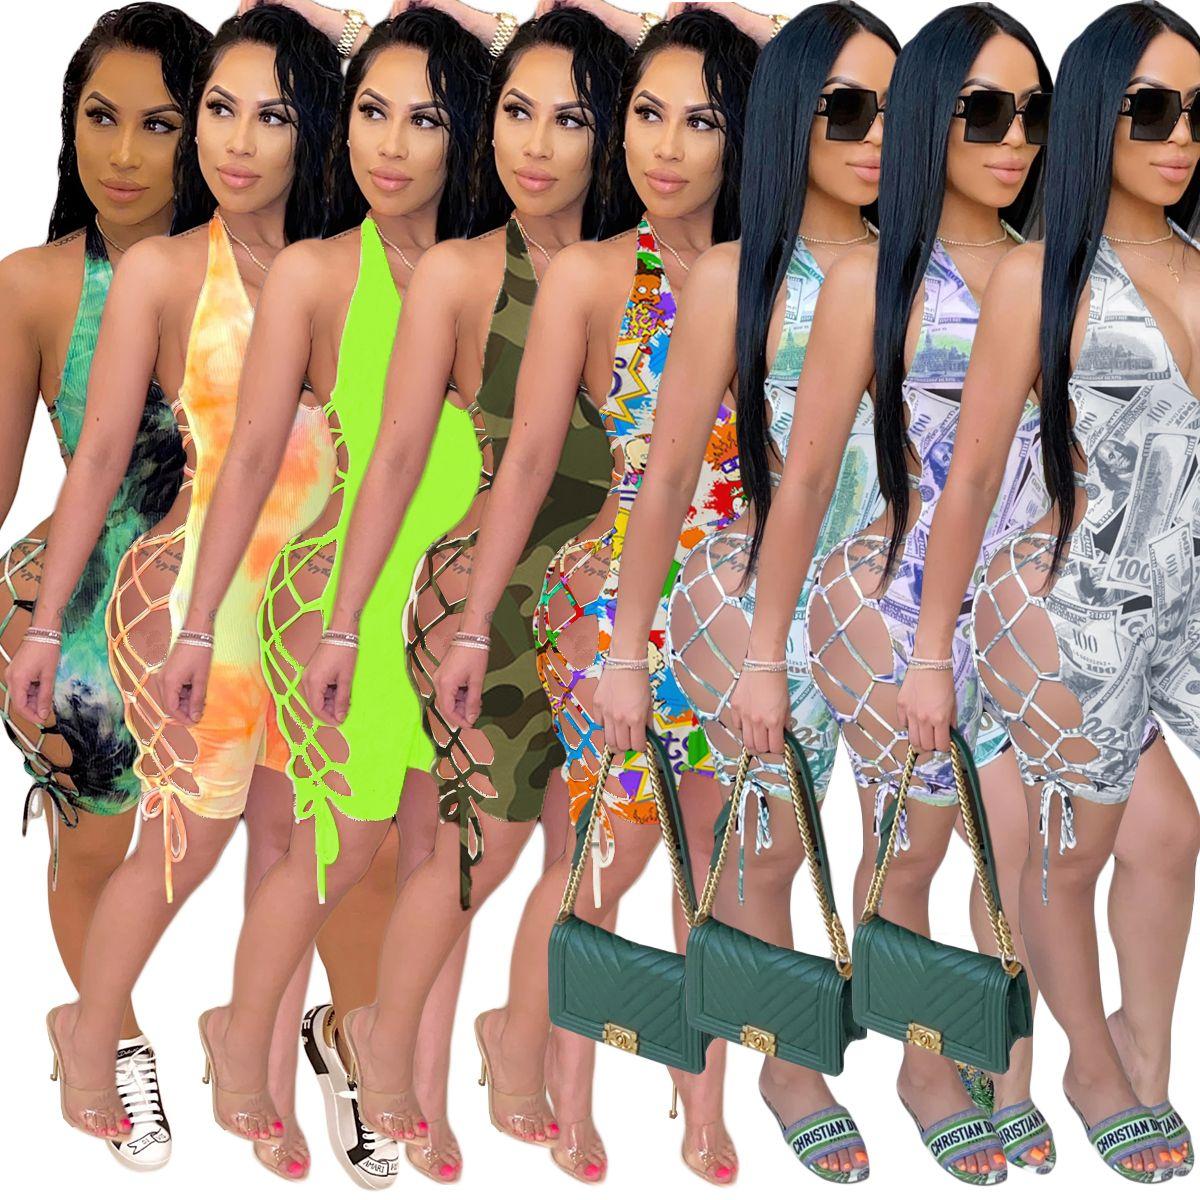 Multi-Muster gedruckt Sexy Frauen Nachtclub Jumpsuits mit Bandagen Halfter mit V-Ausschnitt Lace up Backless Nachtclub-Party-Dame Playsuits Shorts